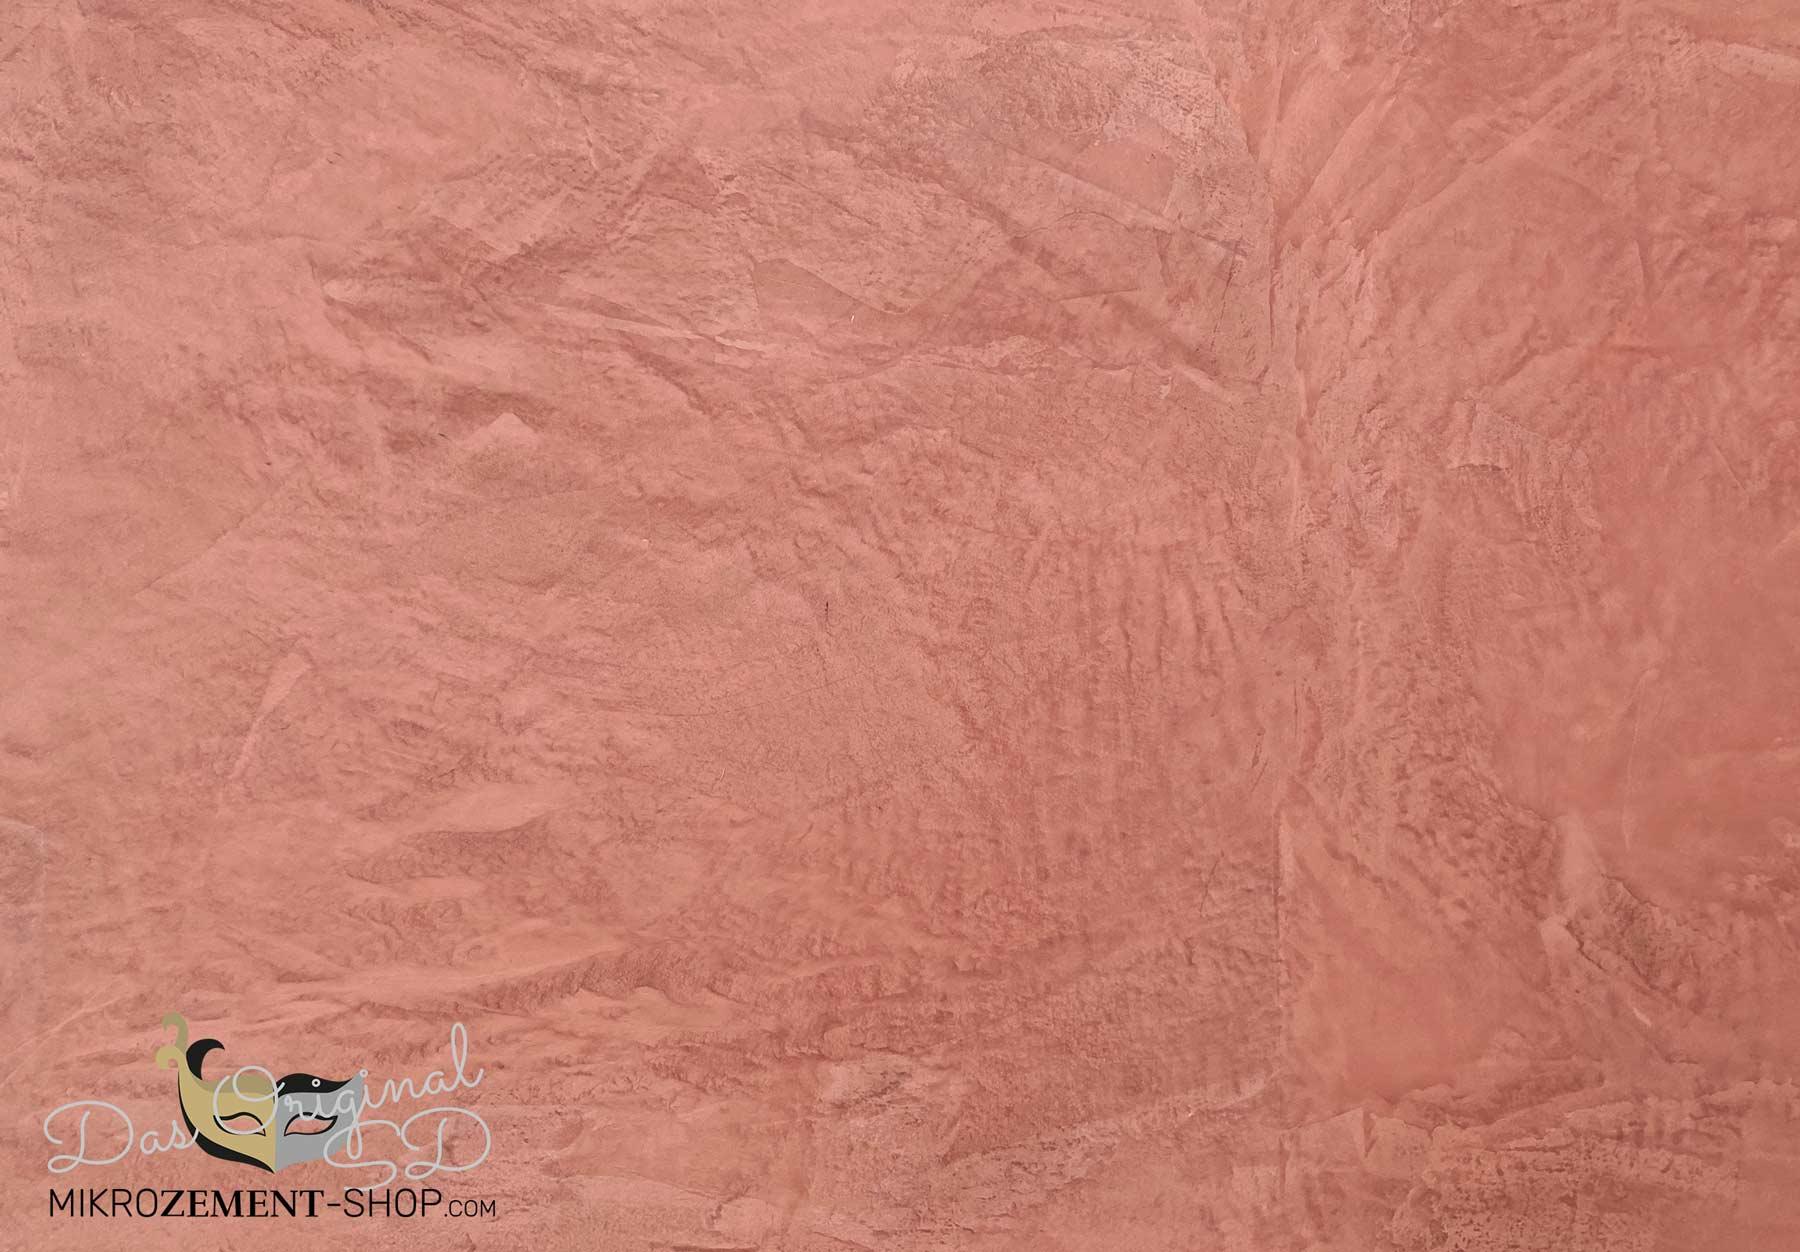 Kupfer Mikrozement